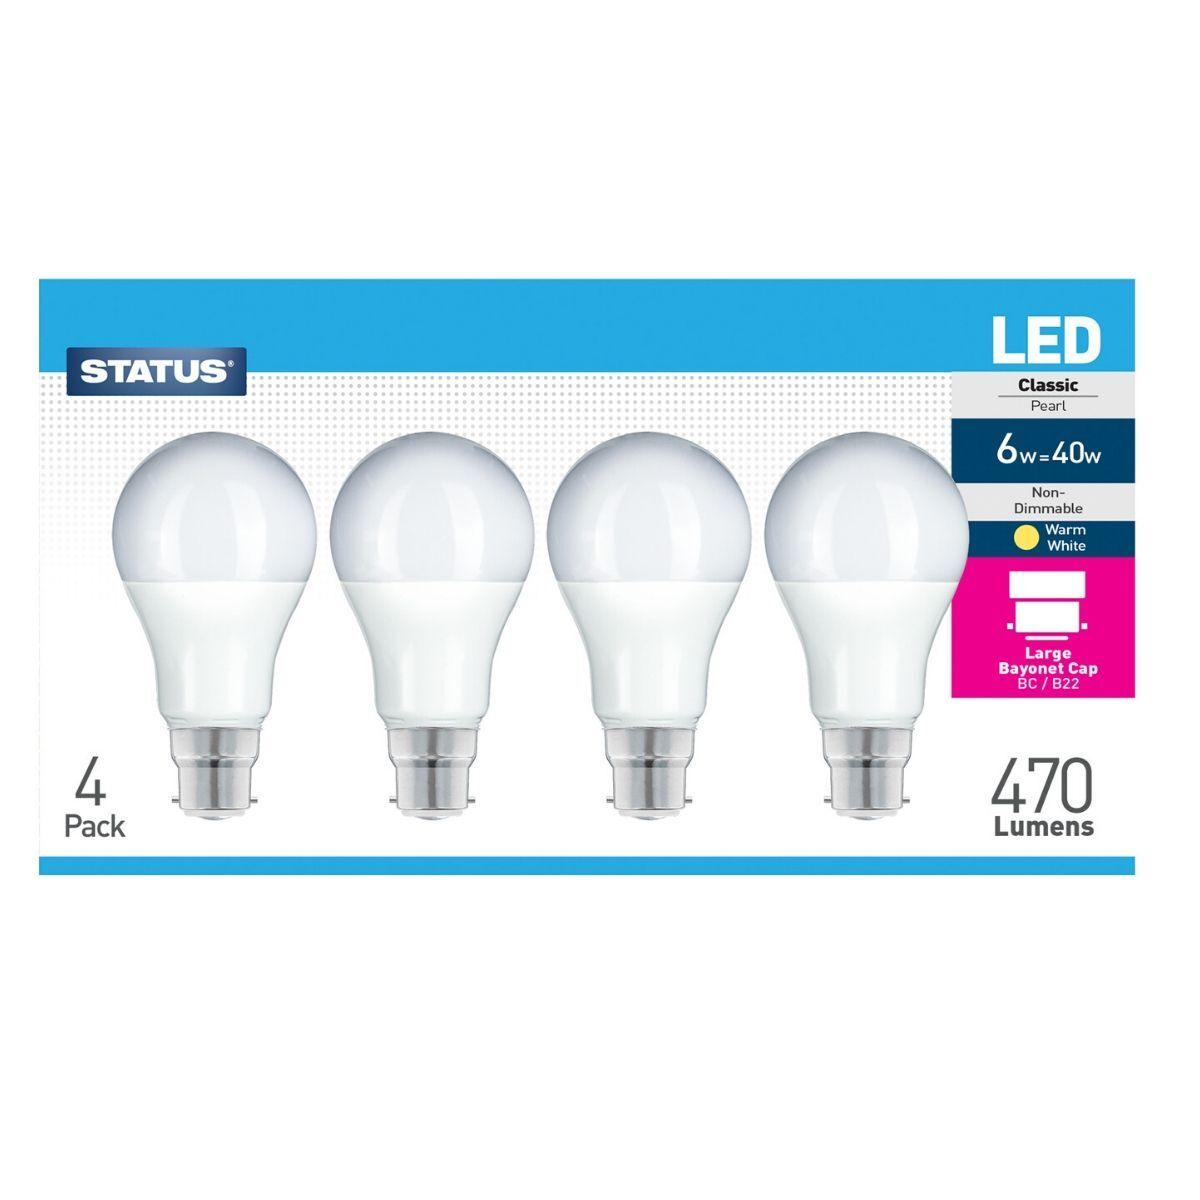 Simple Lighting 4 Pack - 6w LED Bulbs, Warm White B22 Bayonet